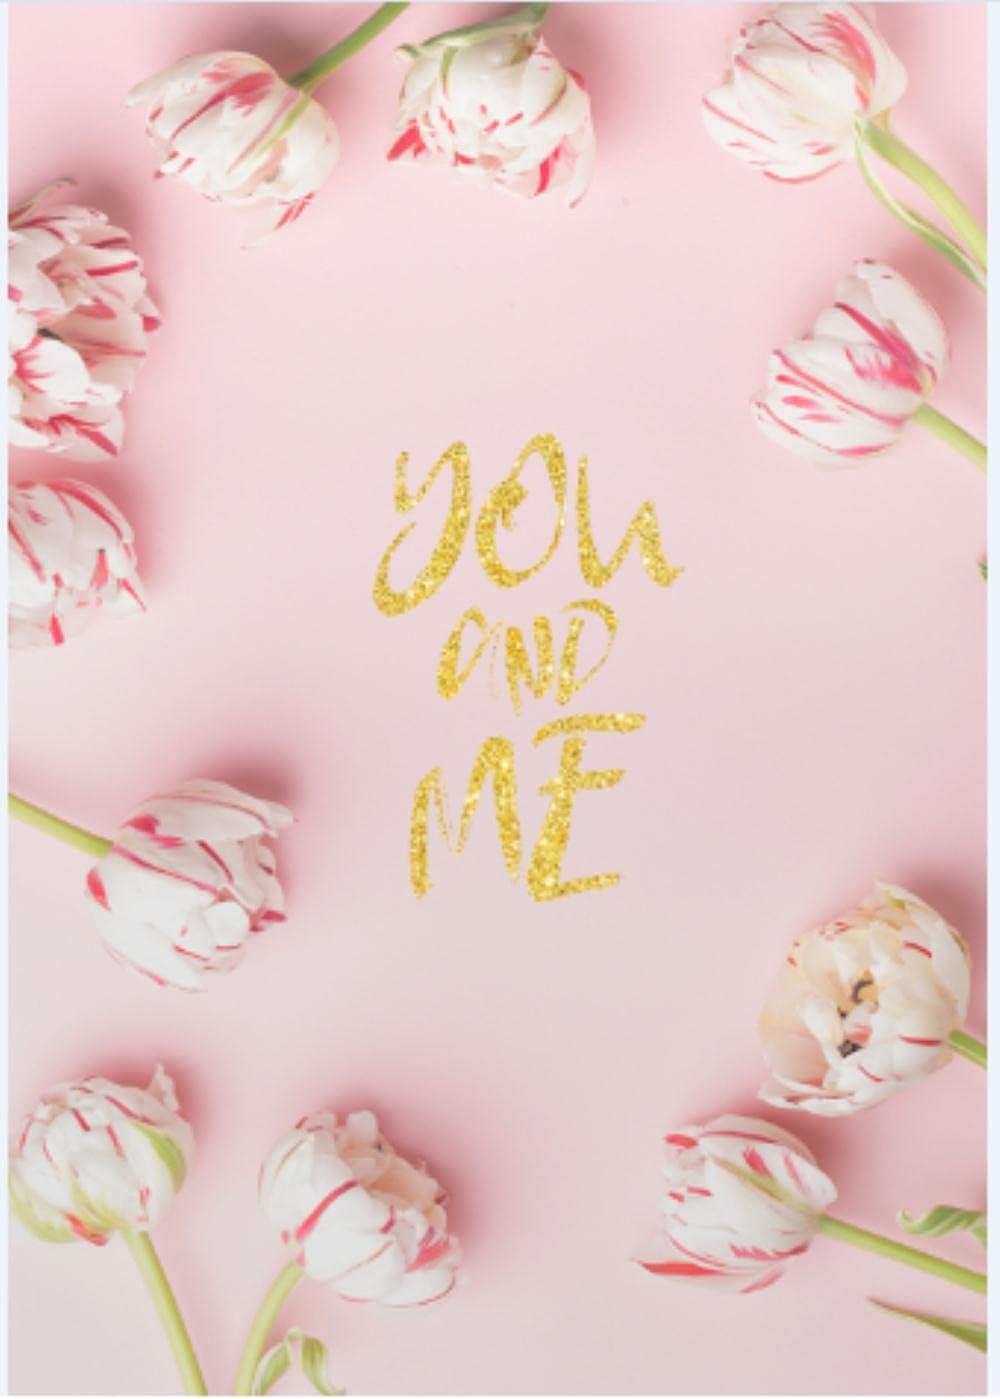 Kansas City Mall MARYSHARON Nordic Simple Modern Girl Heart F Free shipping on posting reviews Swan Rose Lake Pink